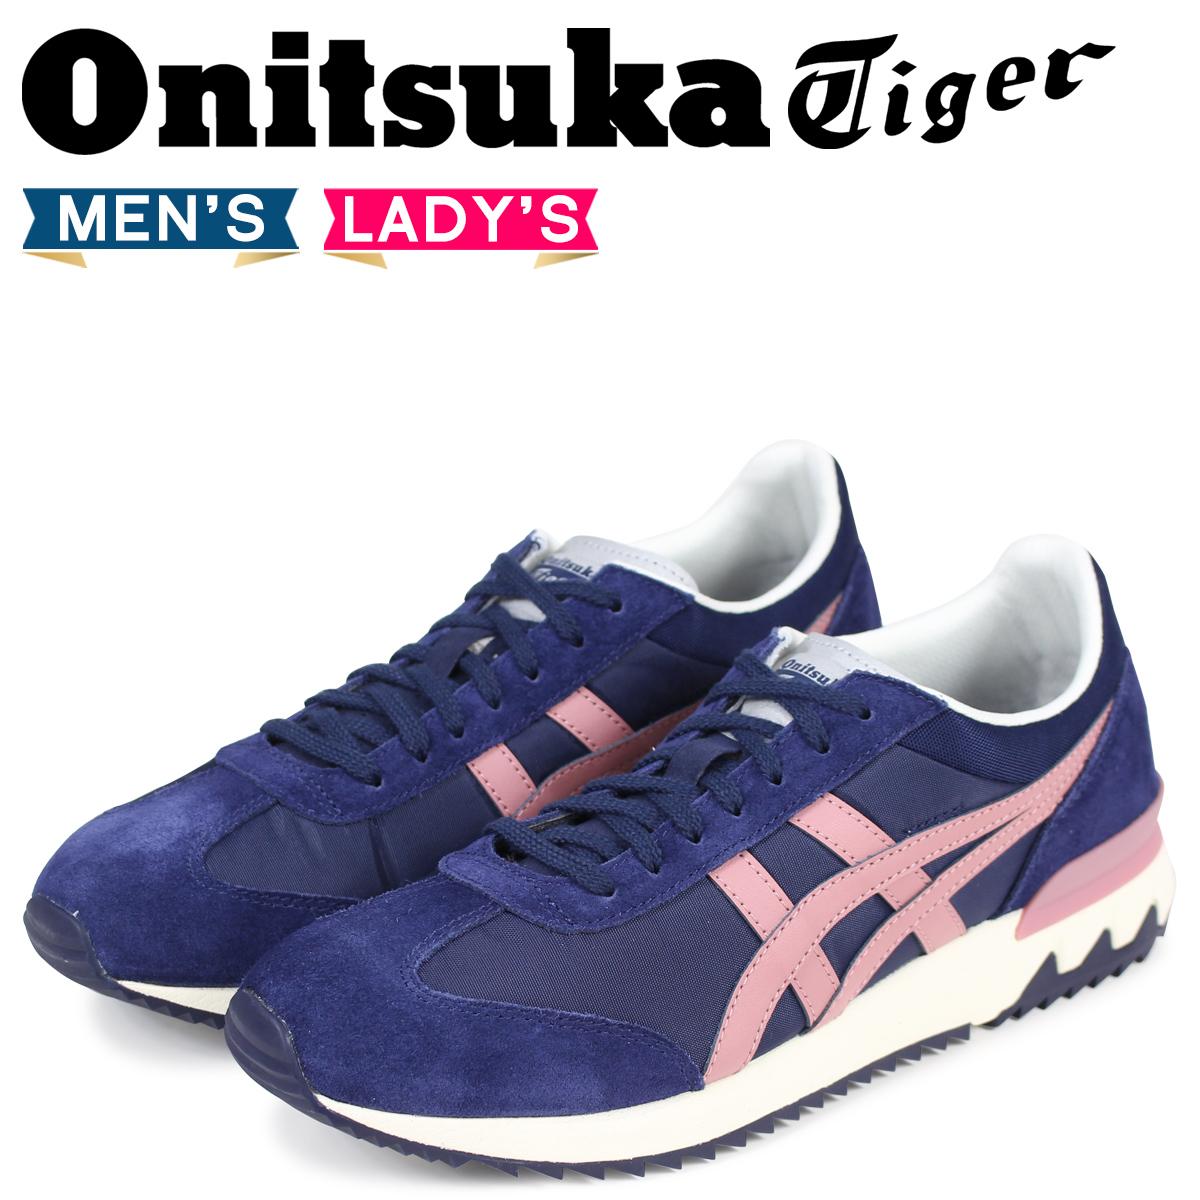 new style 8995e a04c5 Onitsuka Tiger California Onitsuka tiger CALIFORNIA 78 EX men gap Dis  sneakers D800N-5824 navy